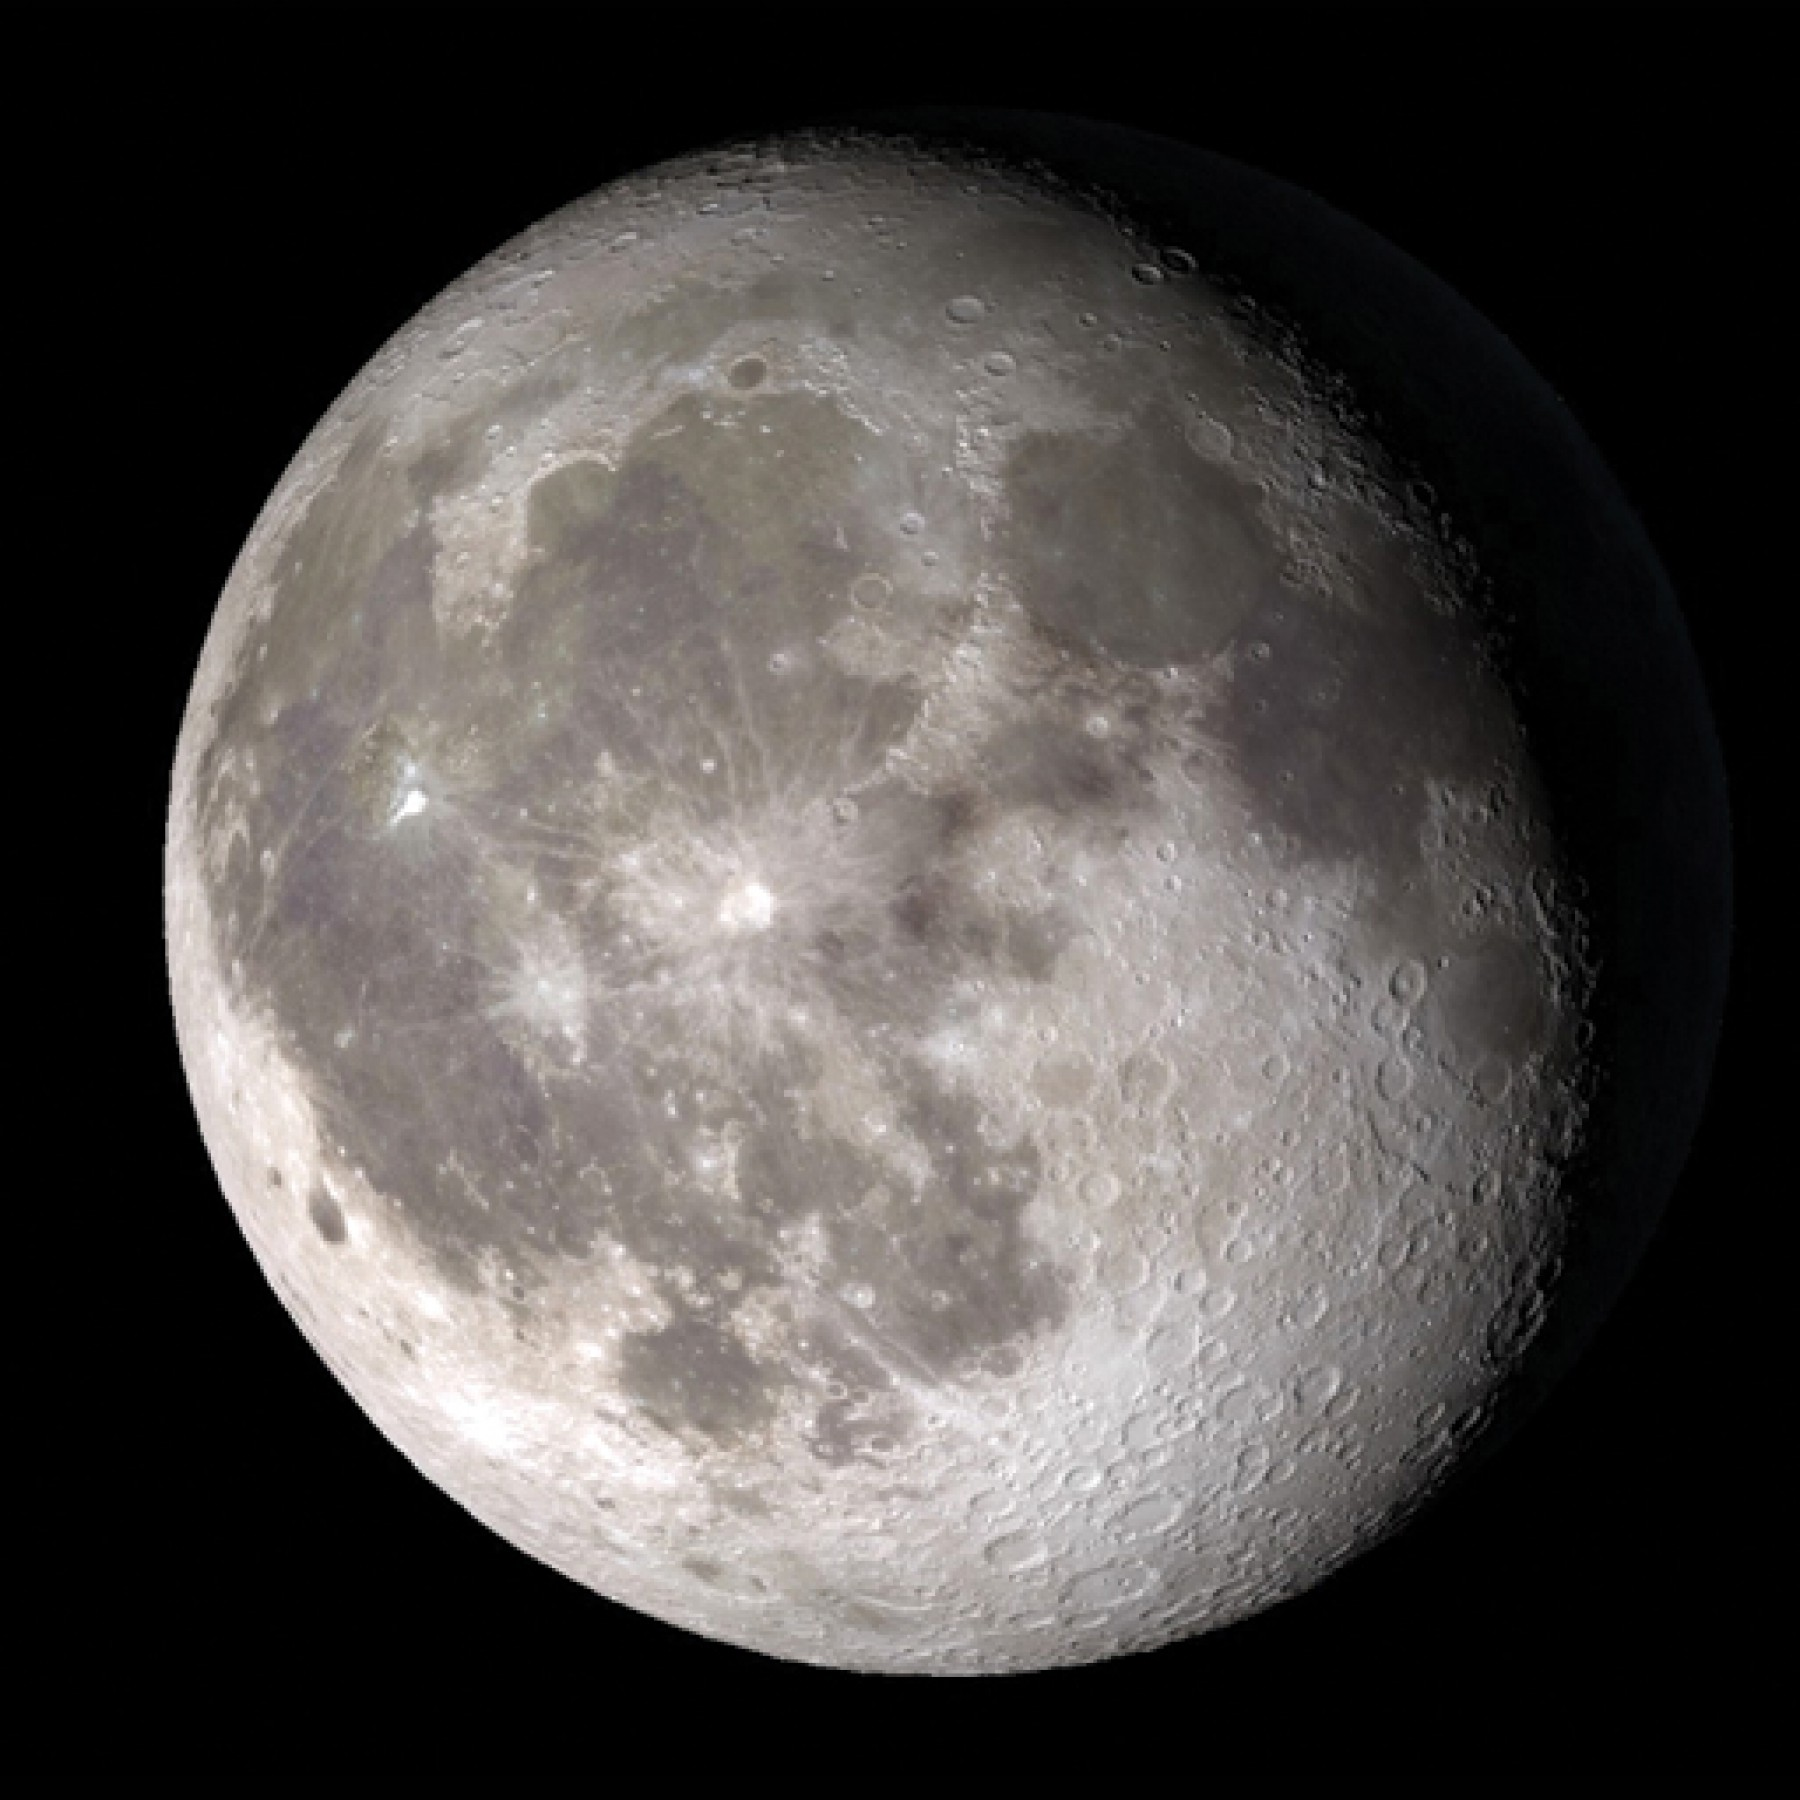 liquid-moon-travel-kids-adults-relaxation-surreal-science-tech-sensory-main-location1